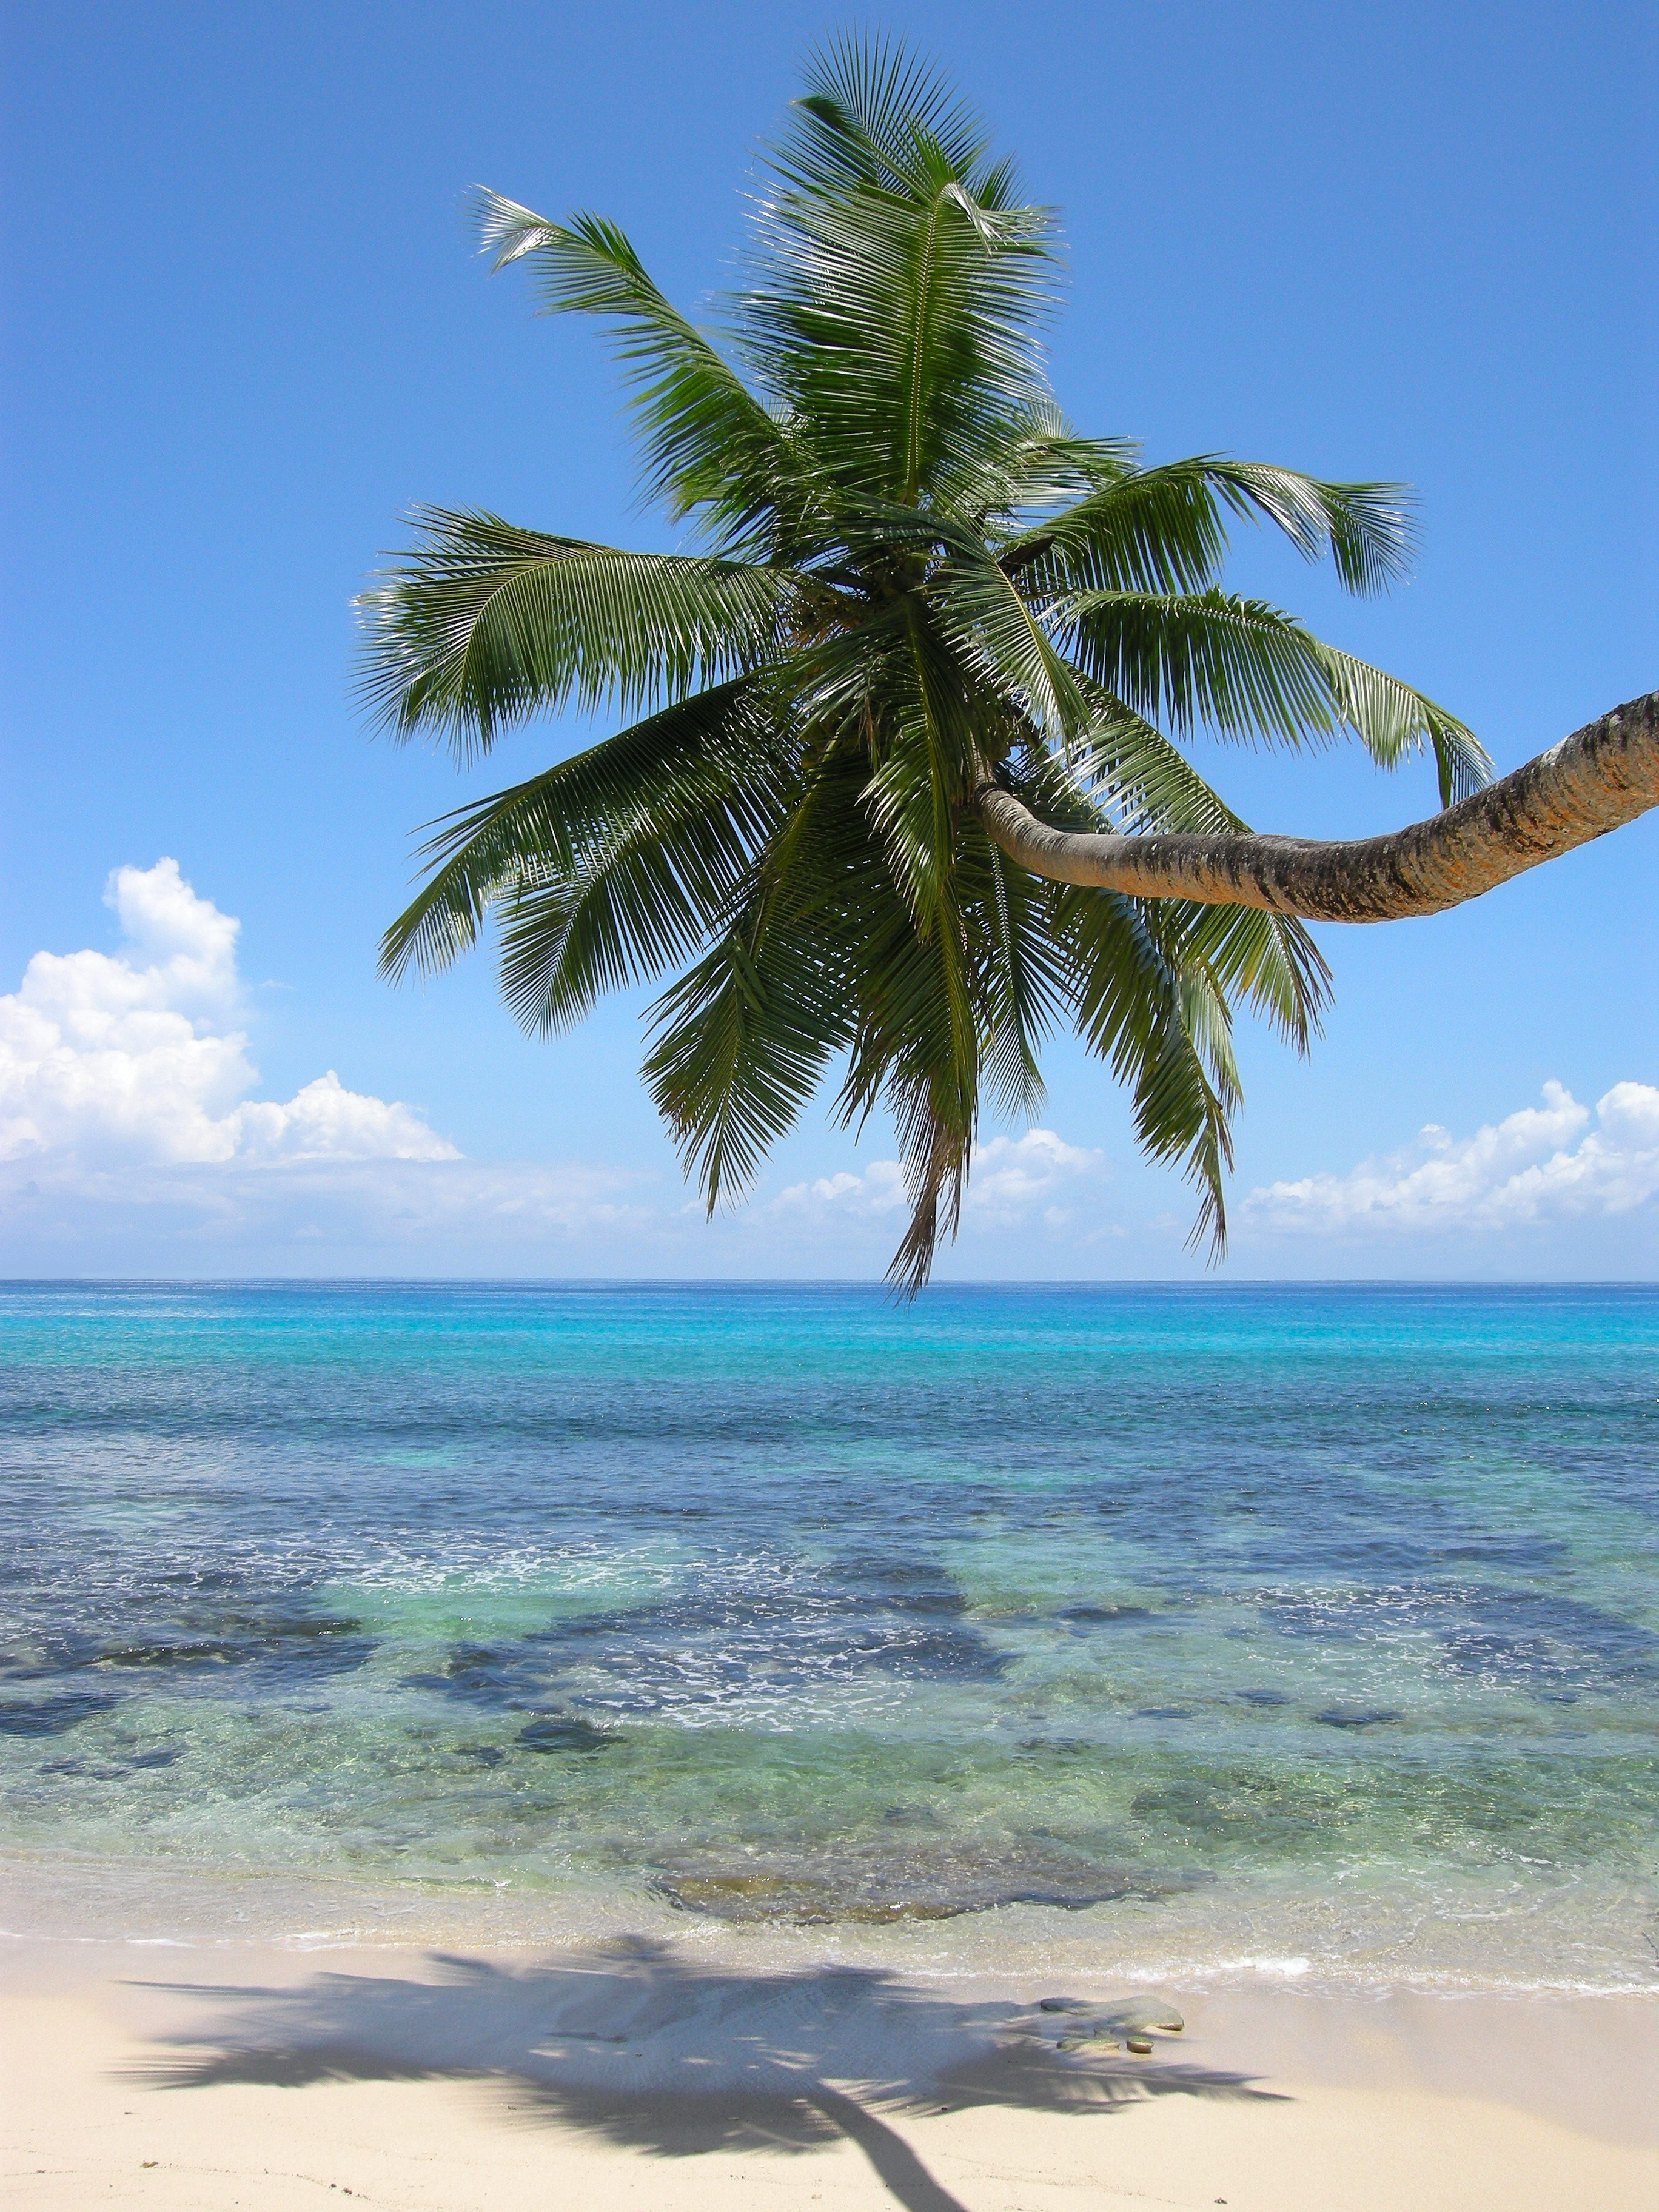 http://upload.wikimedia.org/wikipedia/commons/b/b7/Anse_Takamaka-Mah%C3%A9-Seychelles.jpg